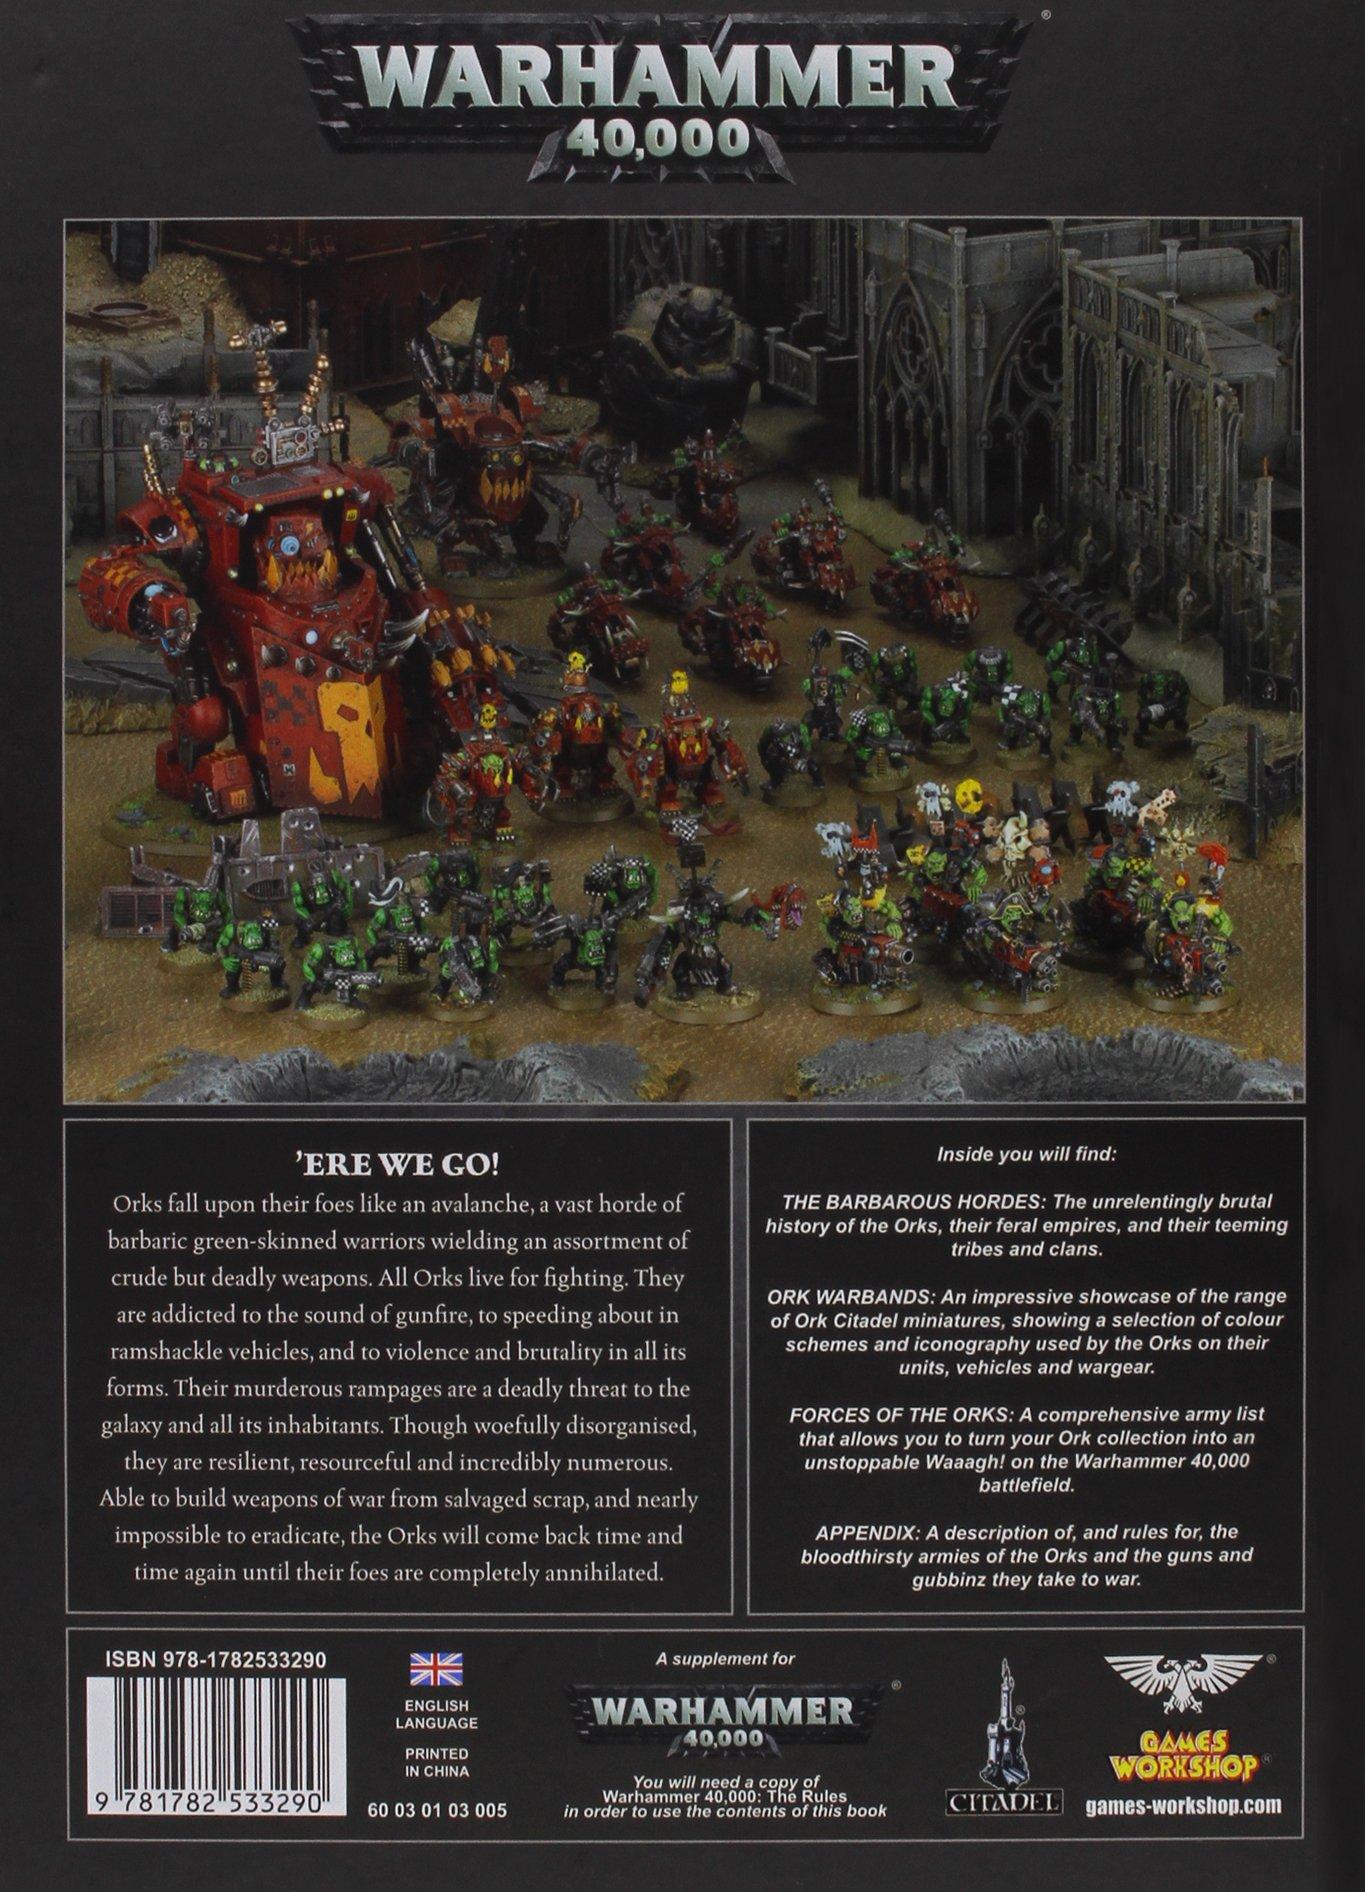 Codex orks english games workshop 9781782533290 amazon books fandeluxe Gallery